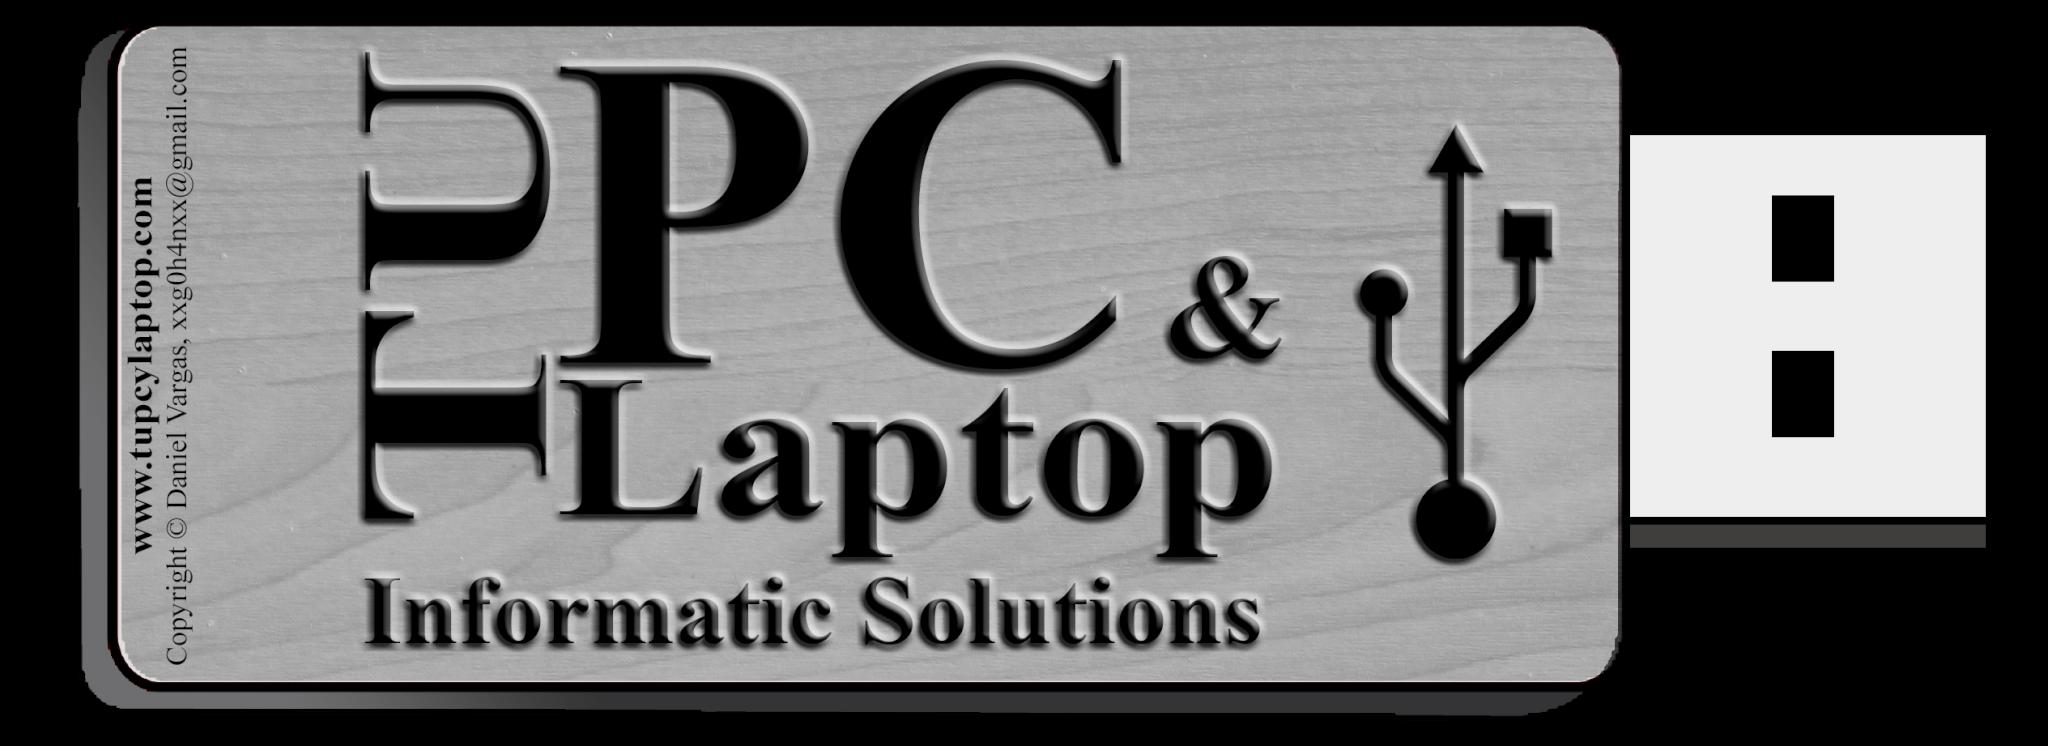 tu pc y laptop